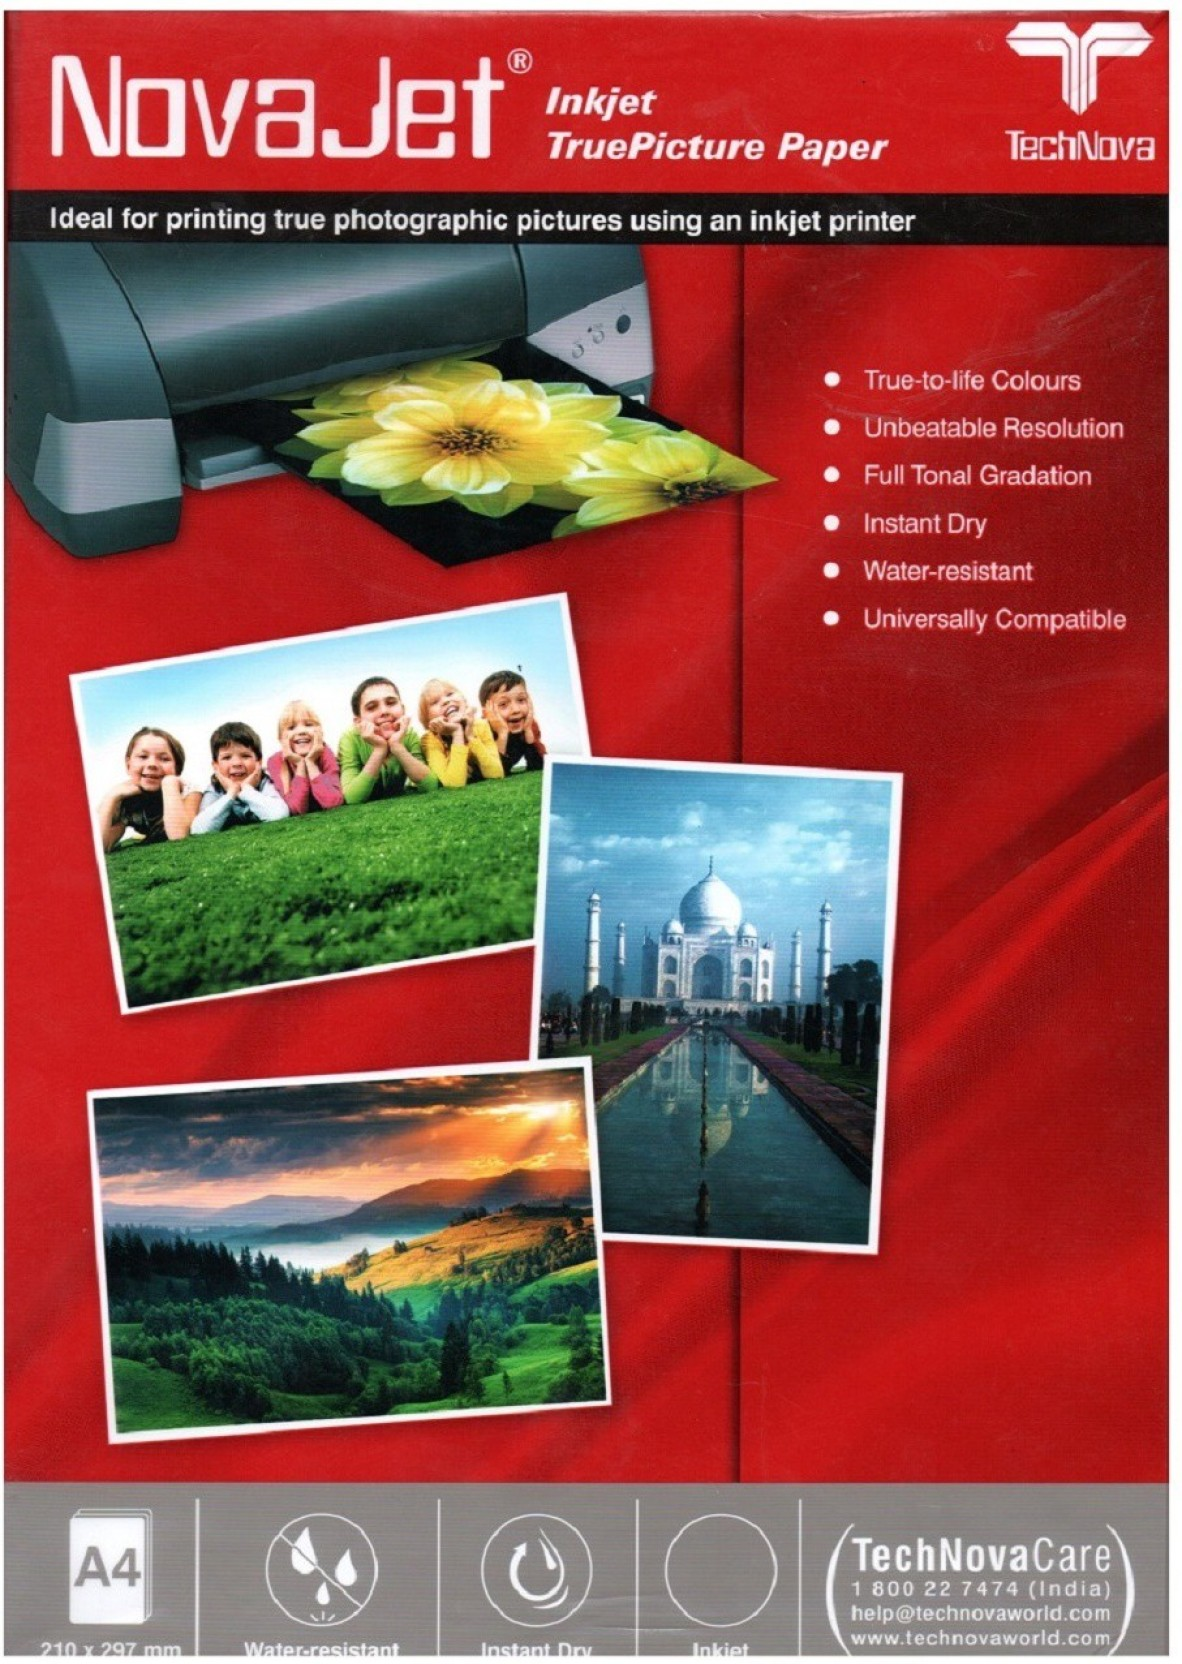 Novajet High Glossy 240 Gsm 20 Sheets Inkjet Photo Royal 90 Polos Envelope 80 White 100 Envelopes Box 1 Home